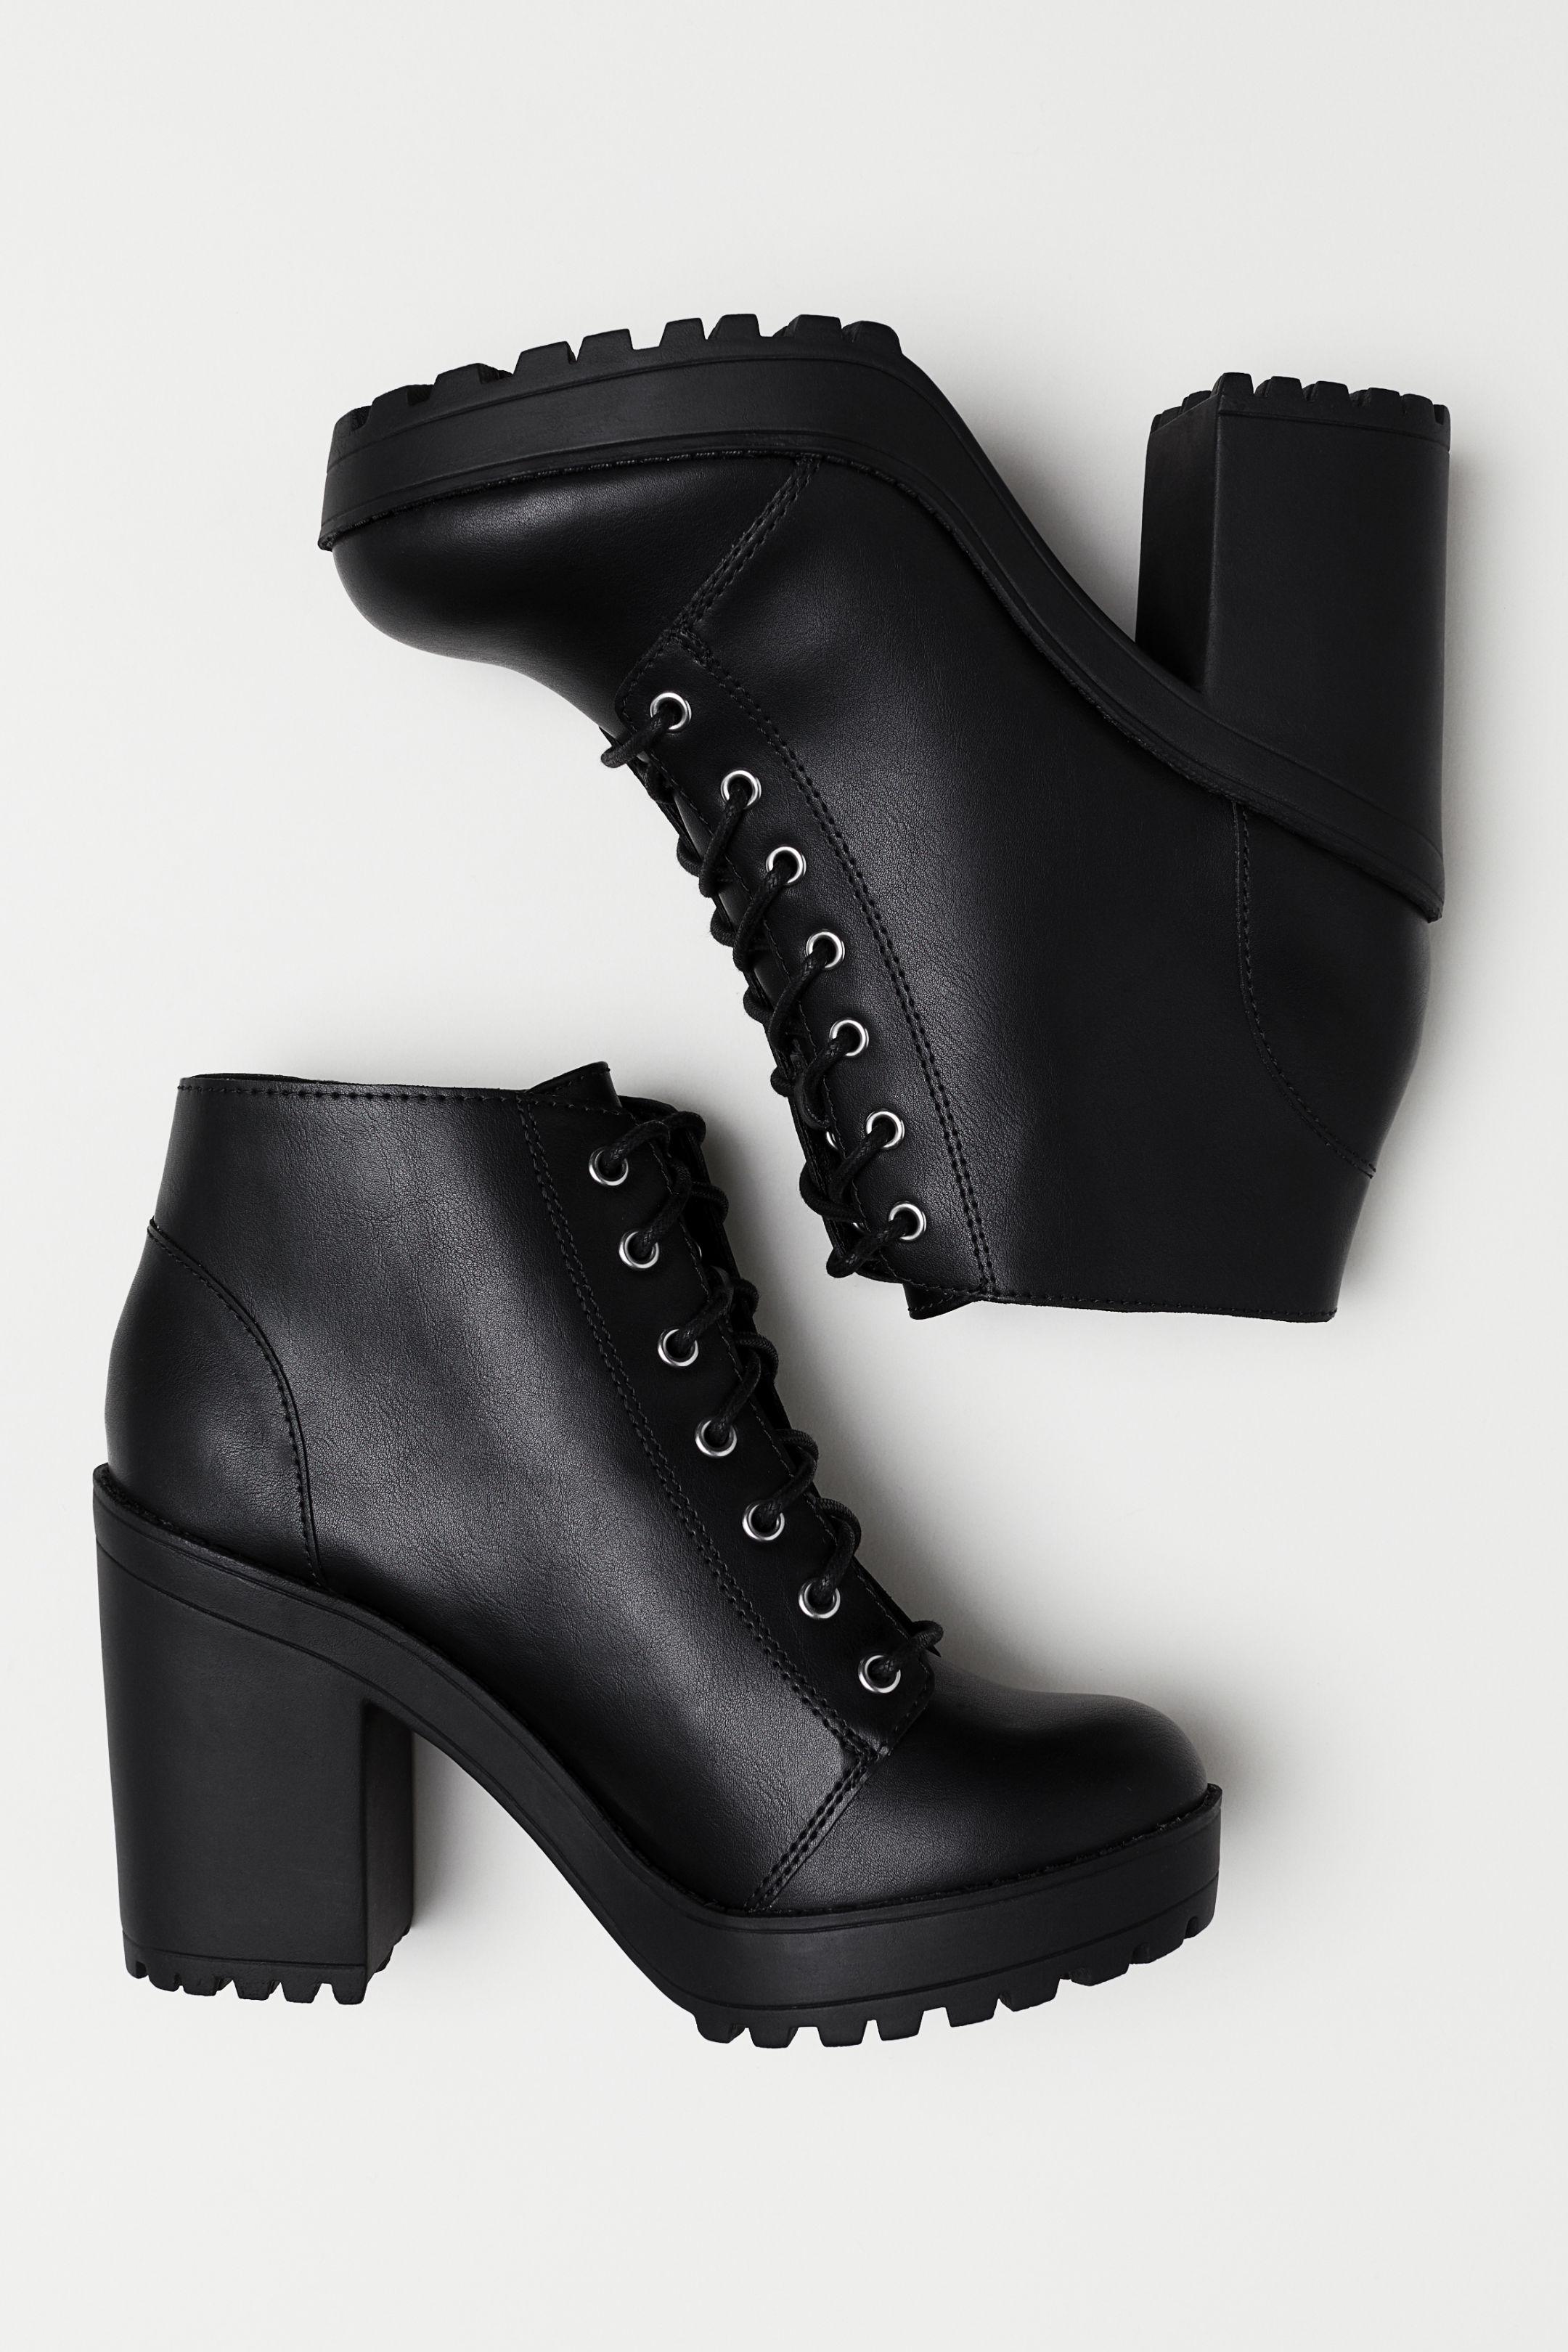 Platform Boots $39.99